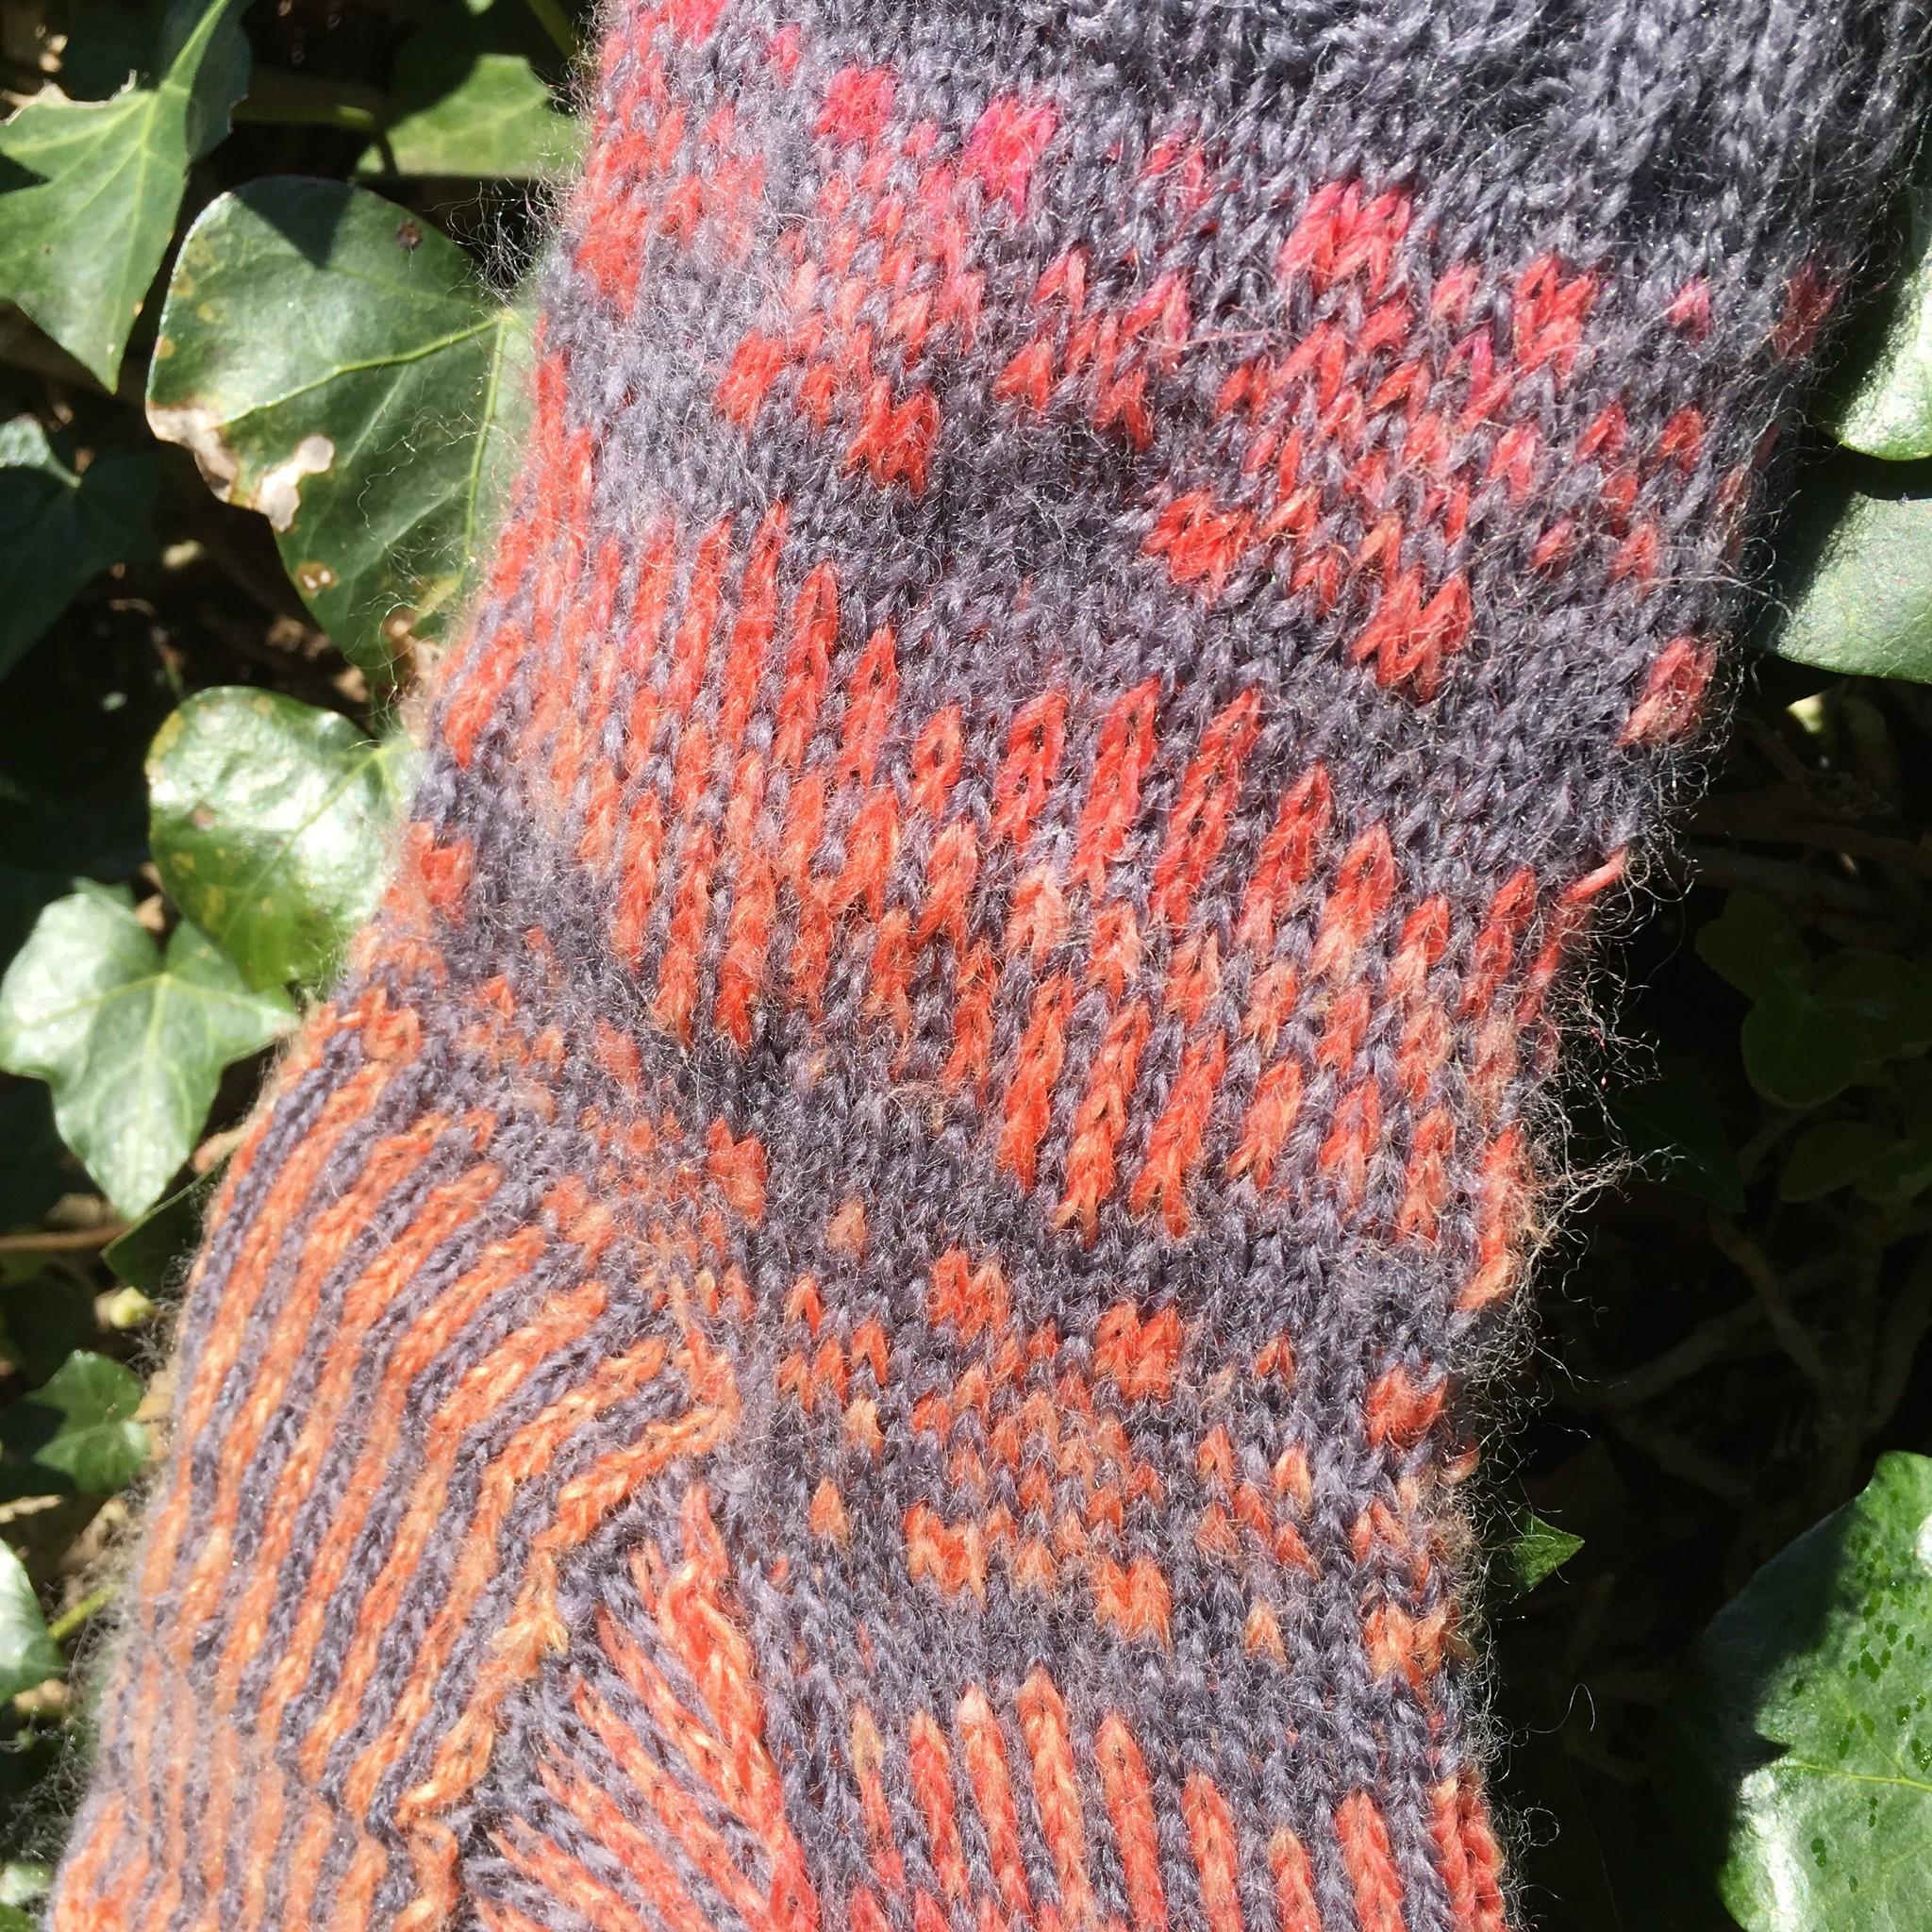 Scheepjeswol BreipakketIn Our DNA Socks